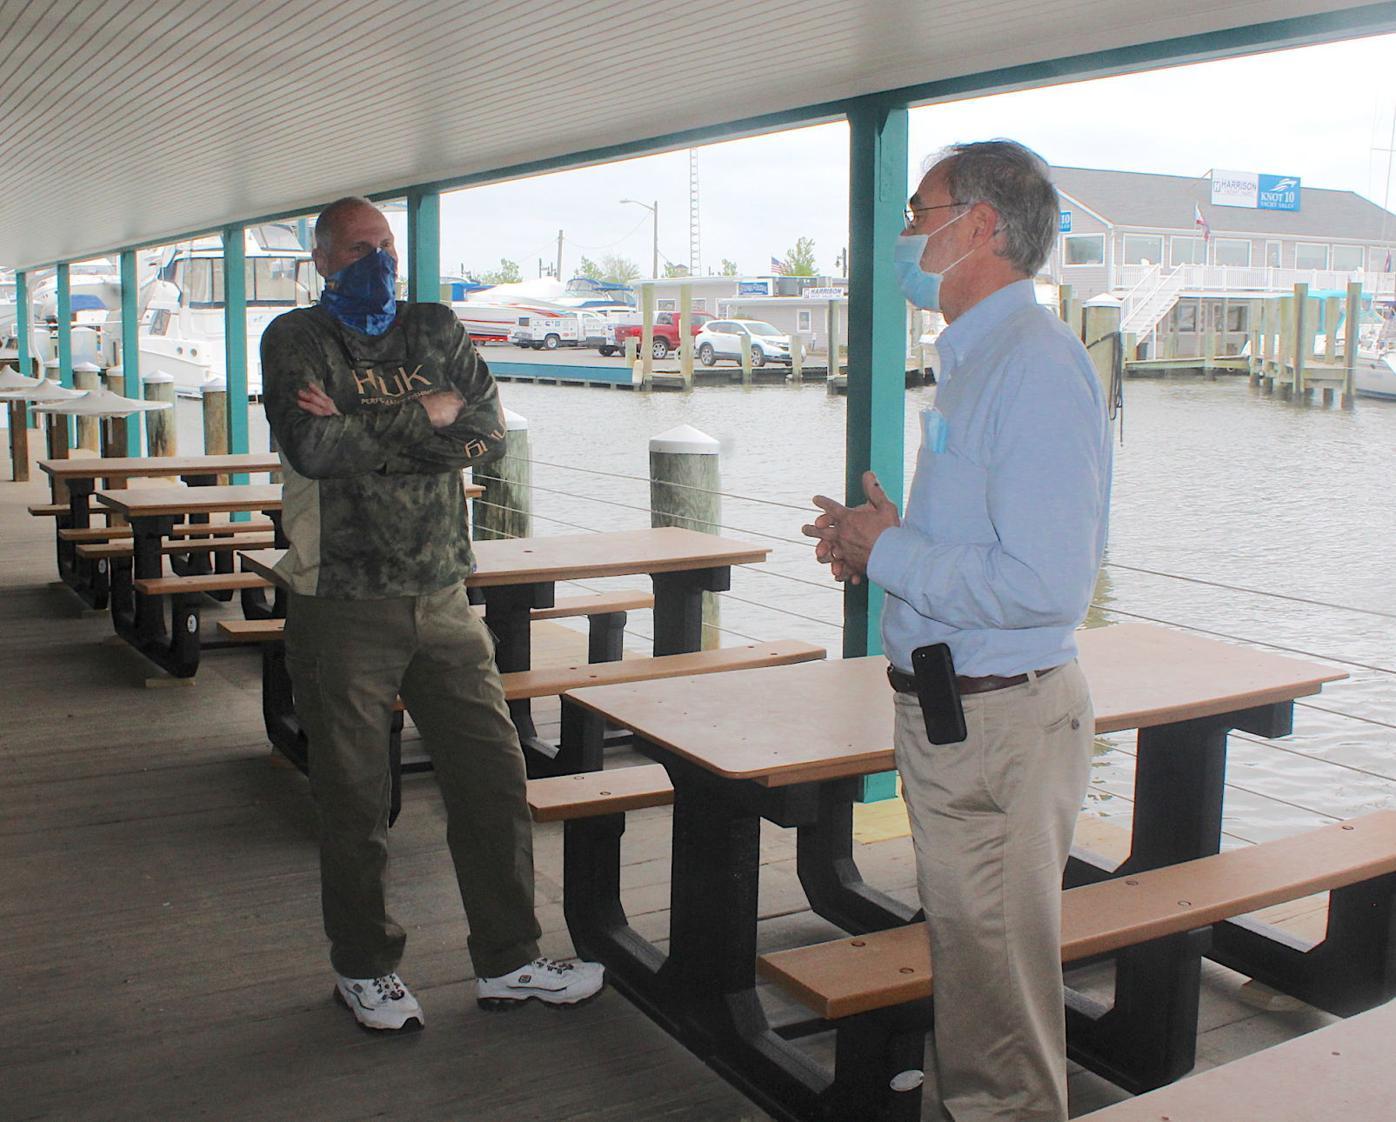 Harris promotes open-air restaurants '20